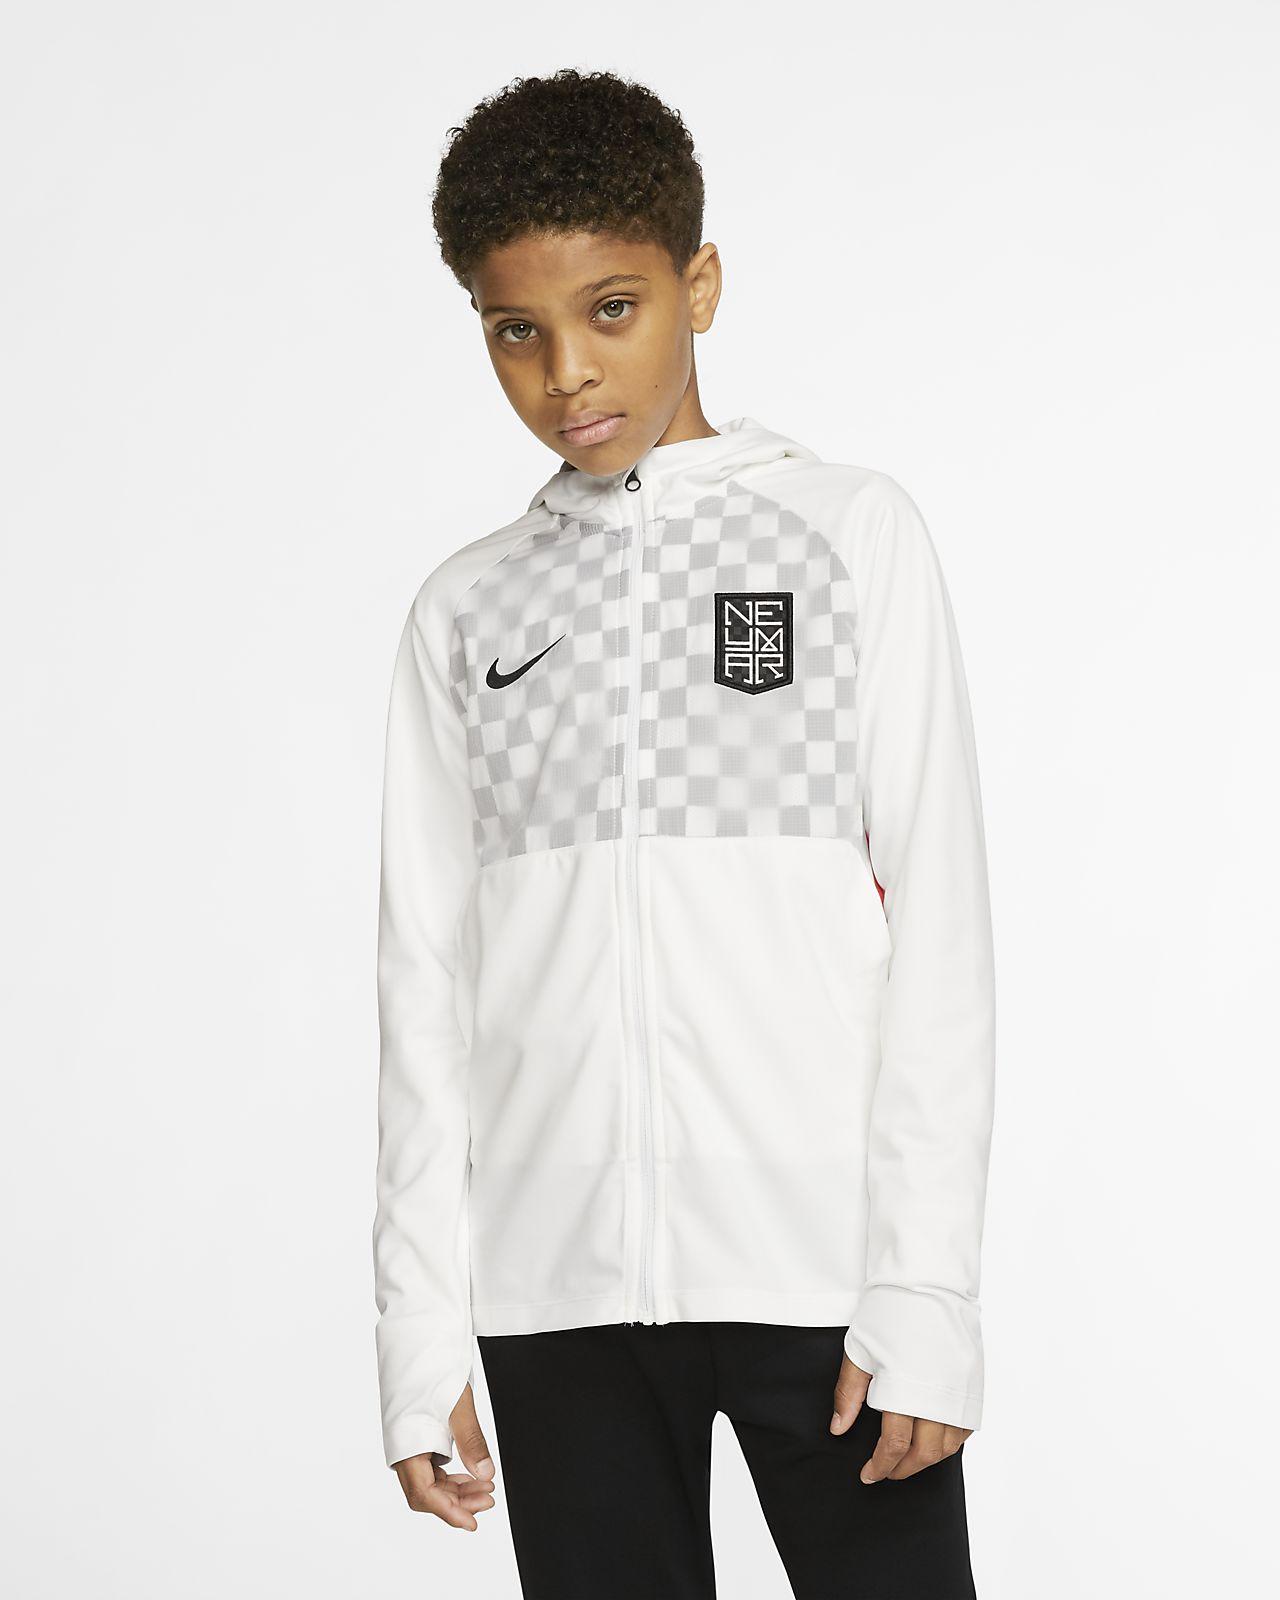 Chamarra de fútbol para niños talla grande Nike Dri-FIT Neymar Jr.